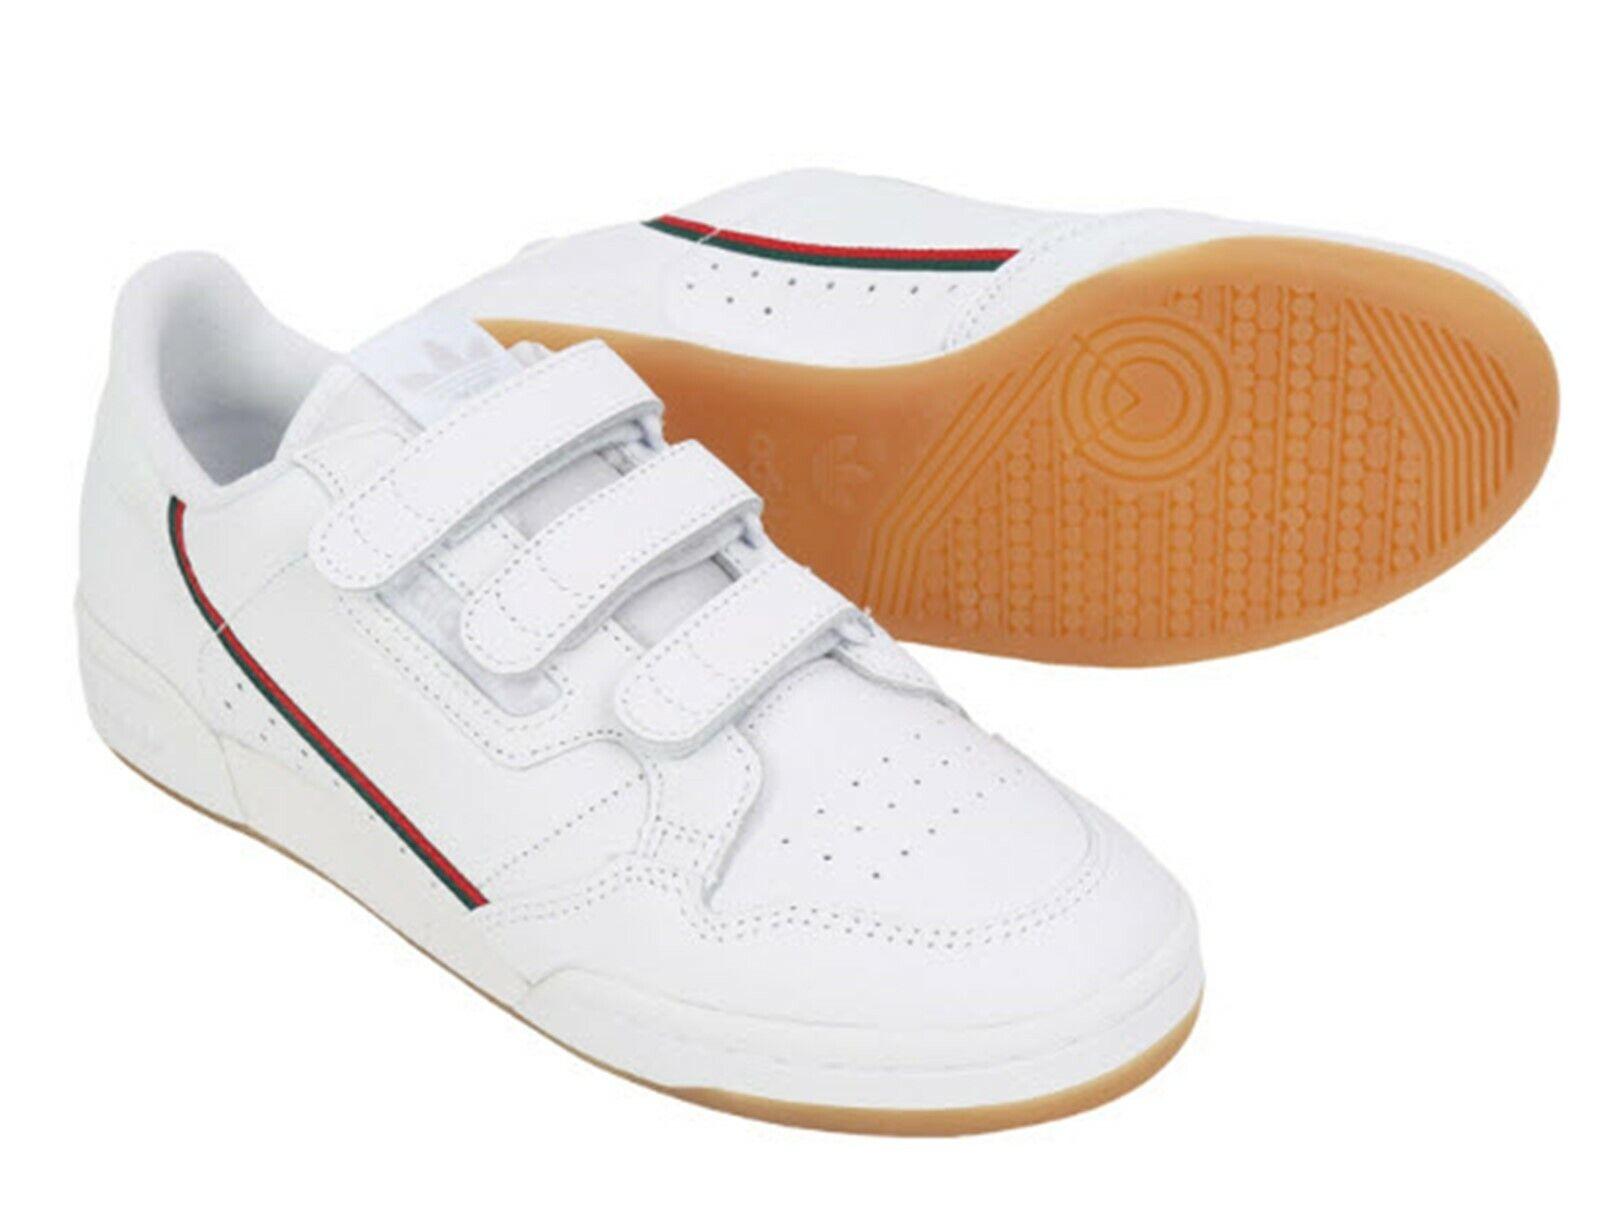 Adidas Men Continental 80 STRAP Schuhe Laufen Weiß Turnschuhe Casual schuhe EE5359